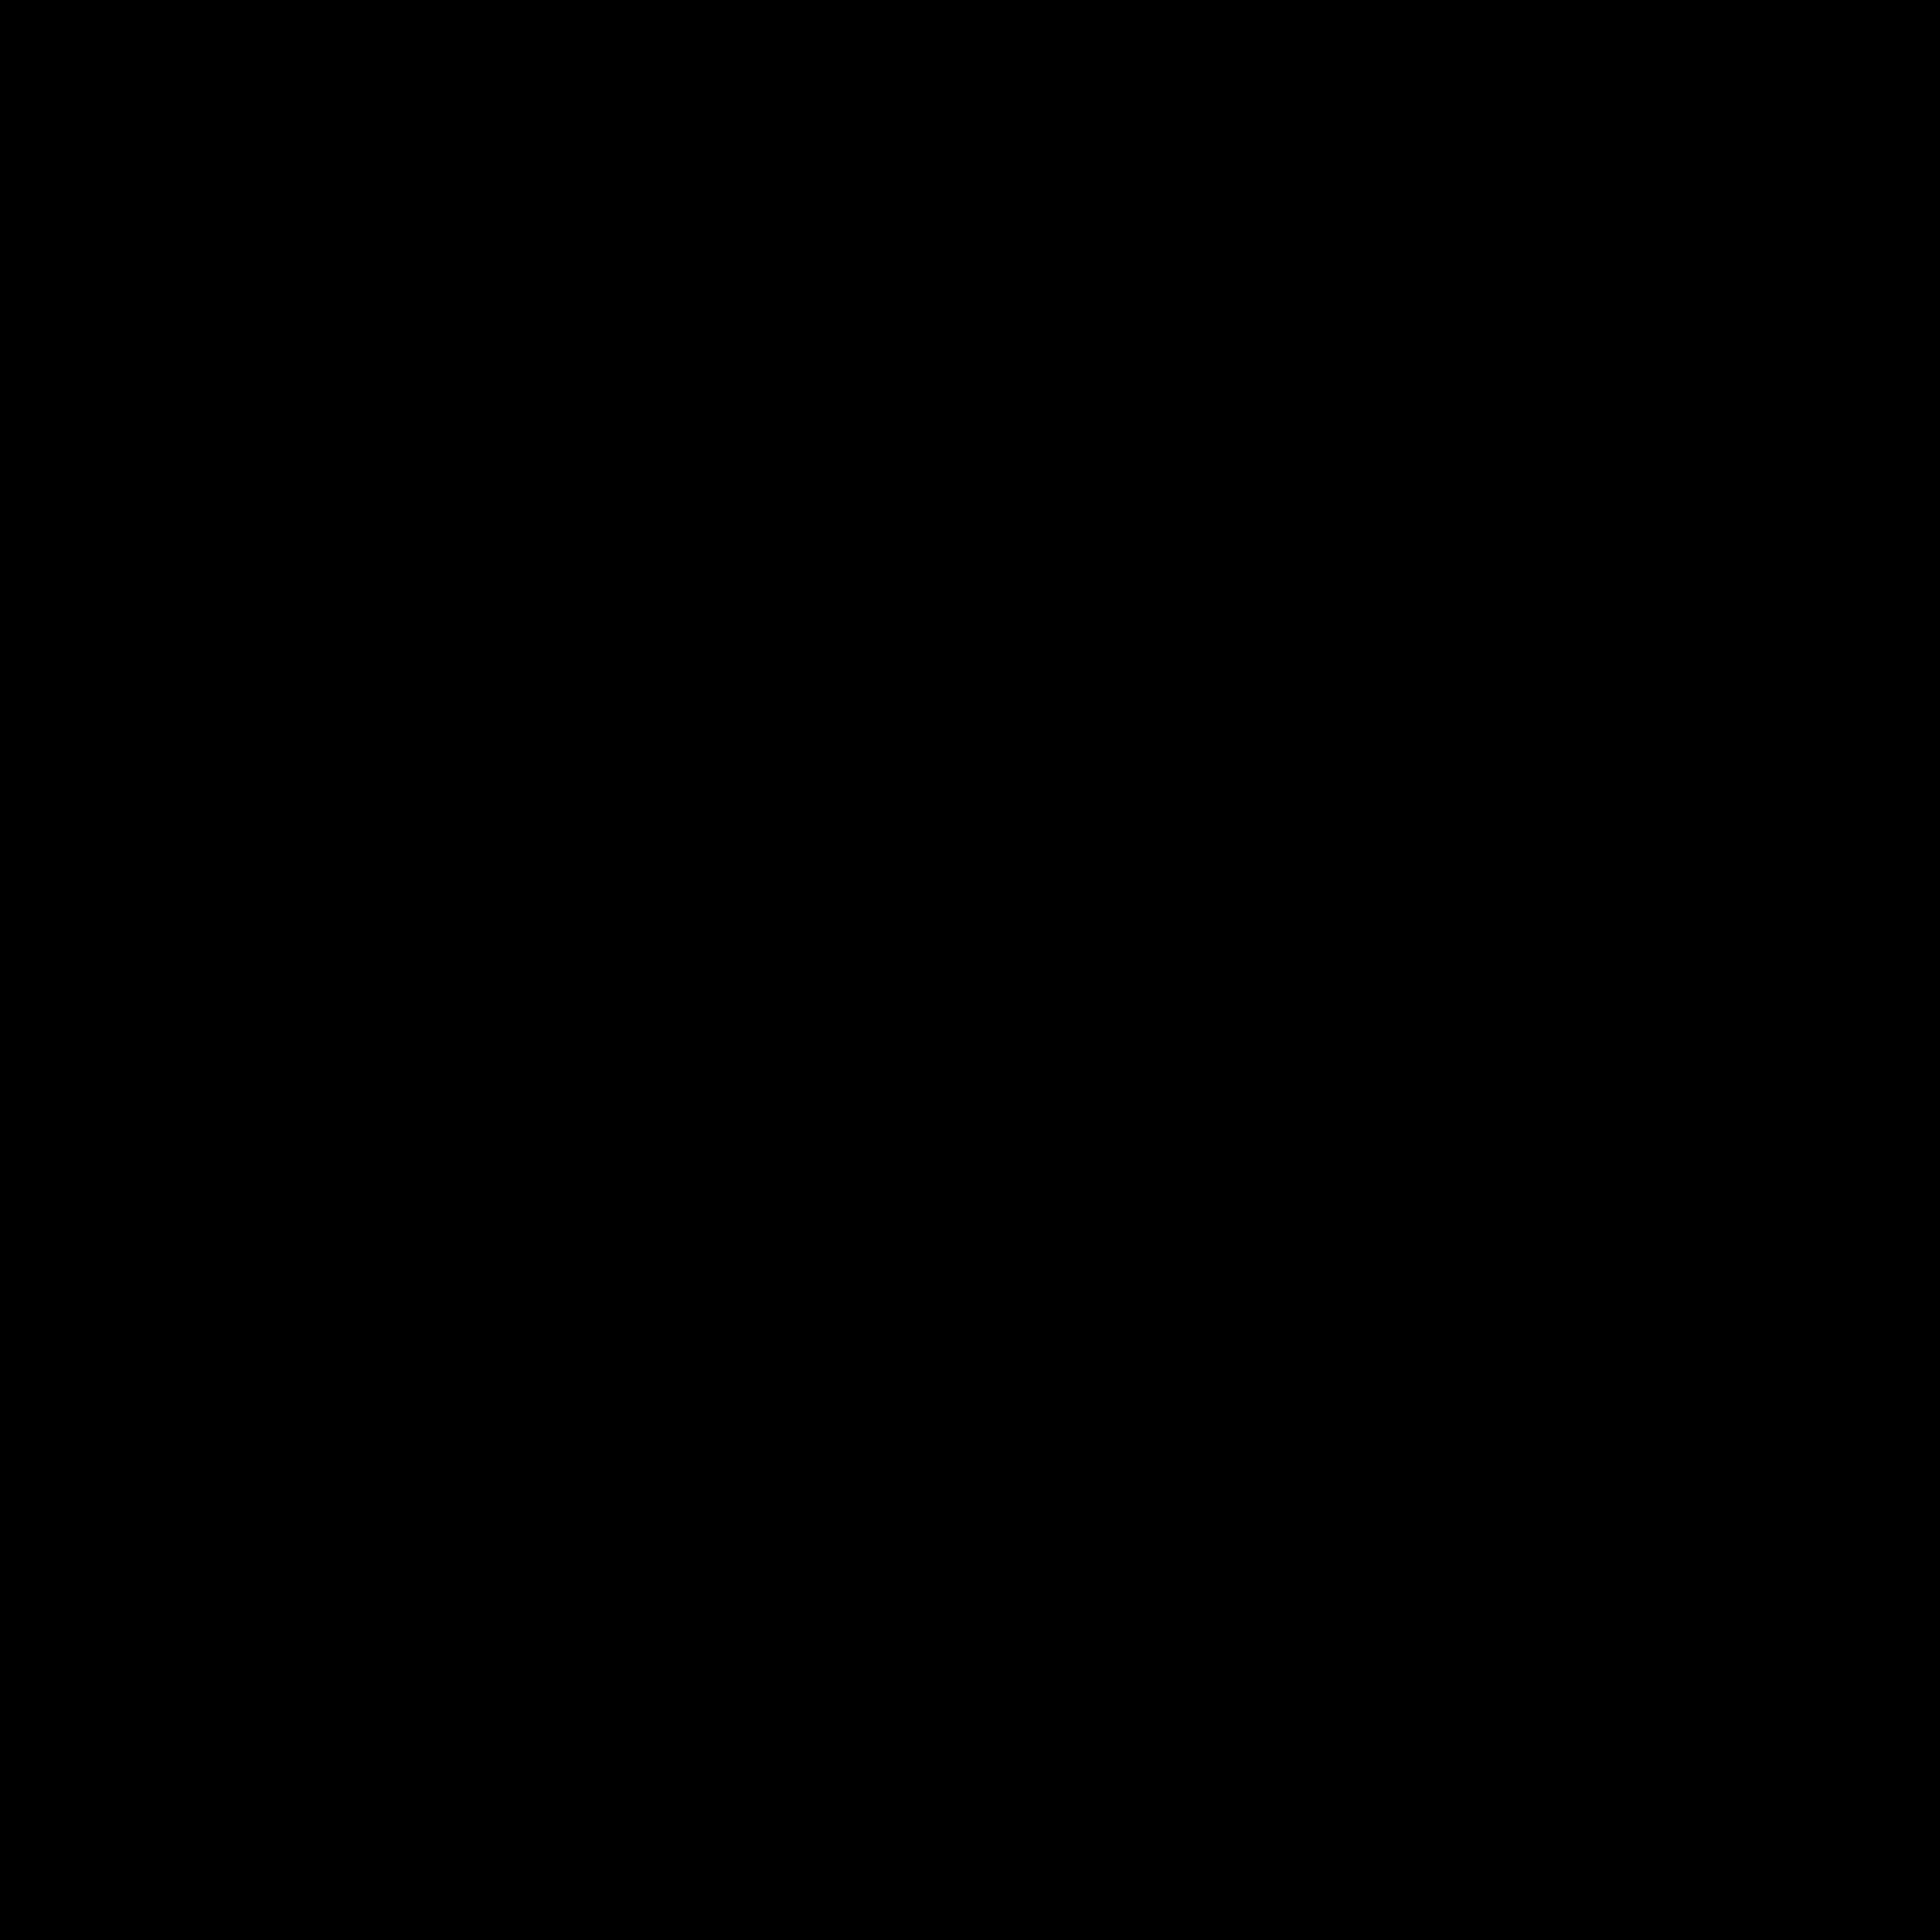 robinhood logo 0 - Robinhood Logo